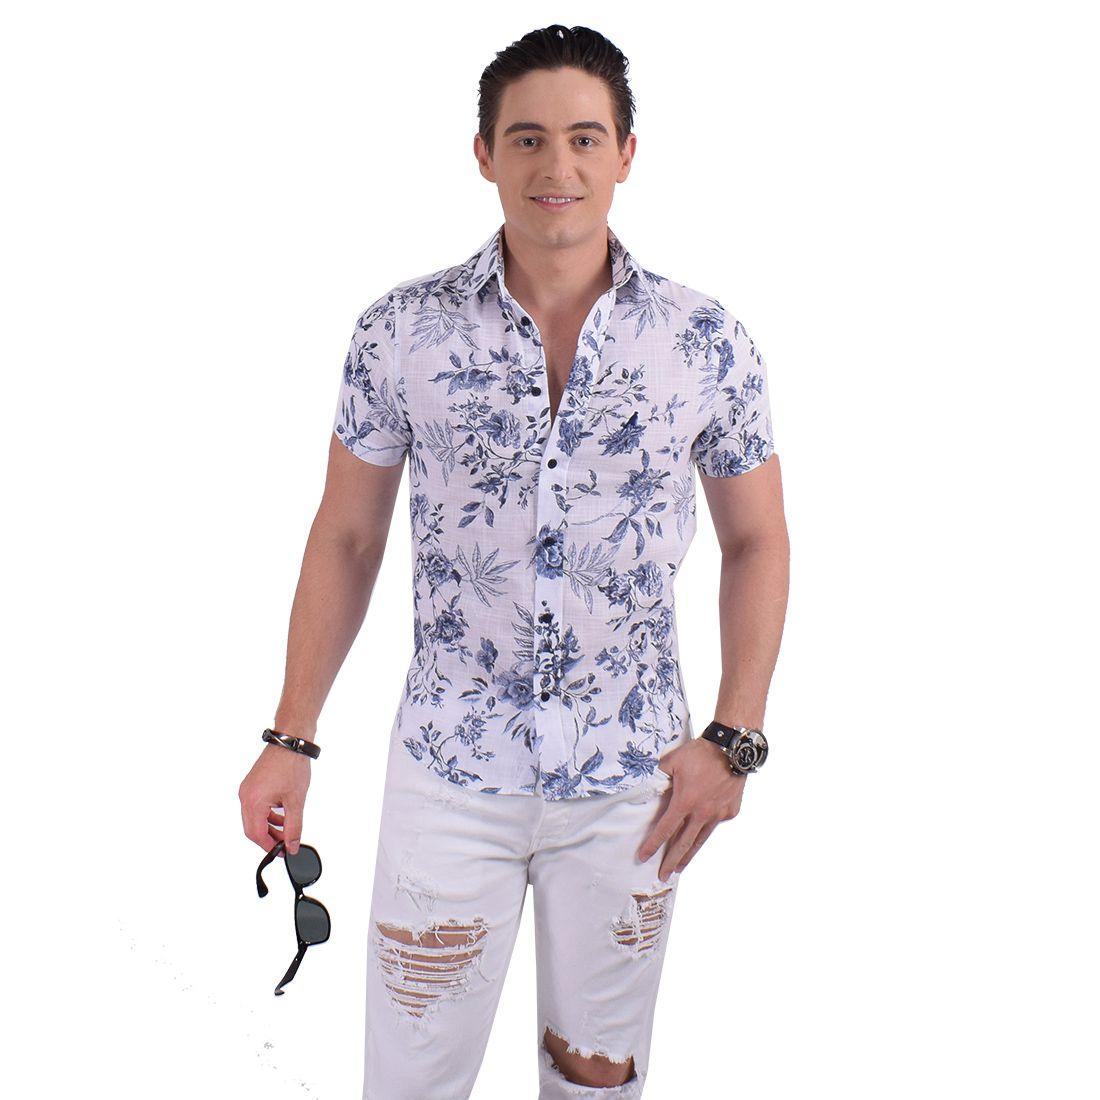 500208 - Camisa Social Manga Curta Masculina Slim Floral - LEVOK